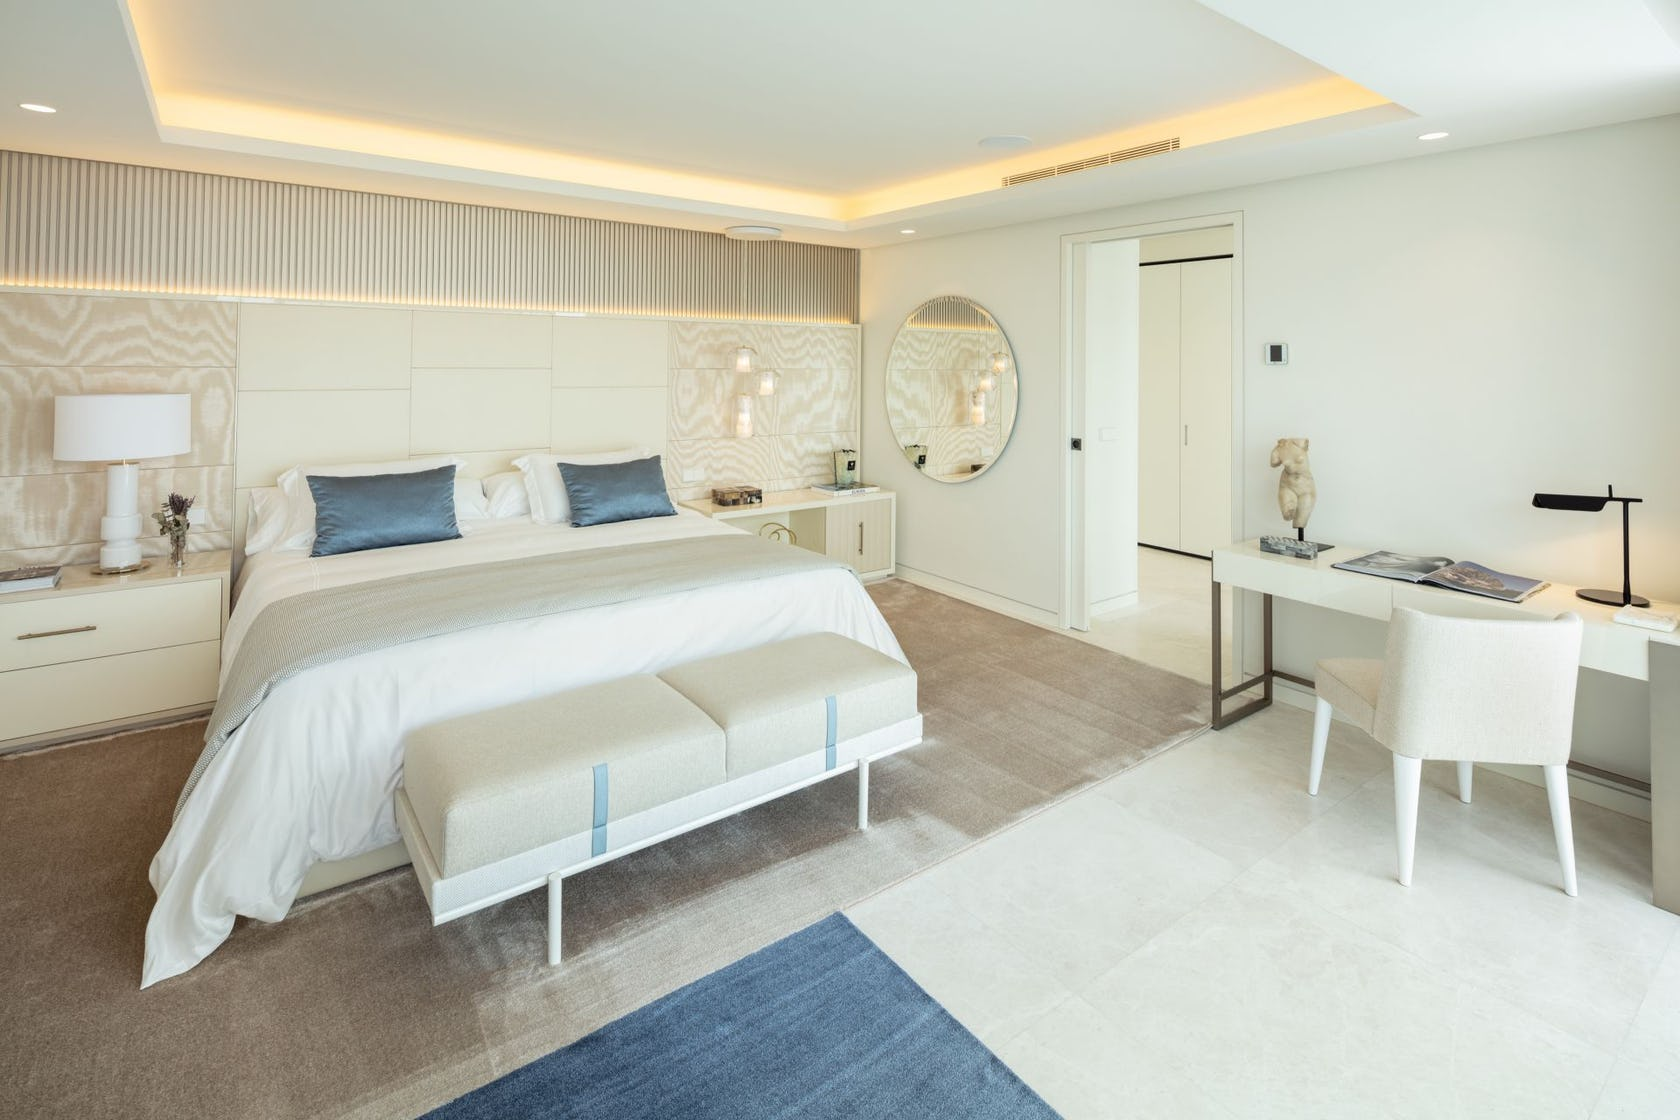 furniture corner bedroom indoors room bed rug